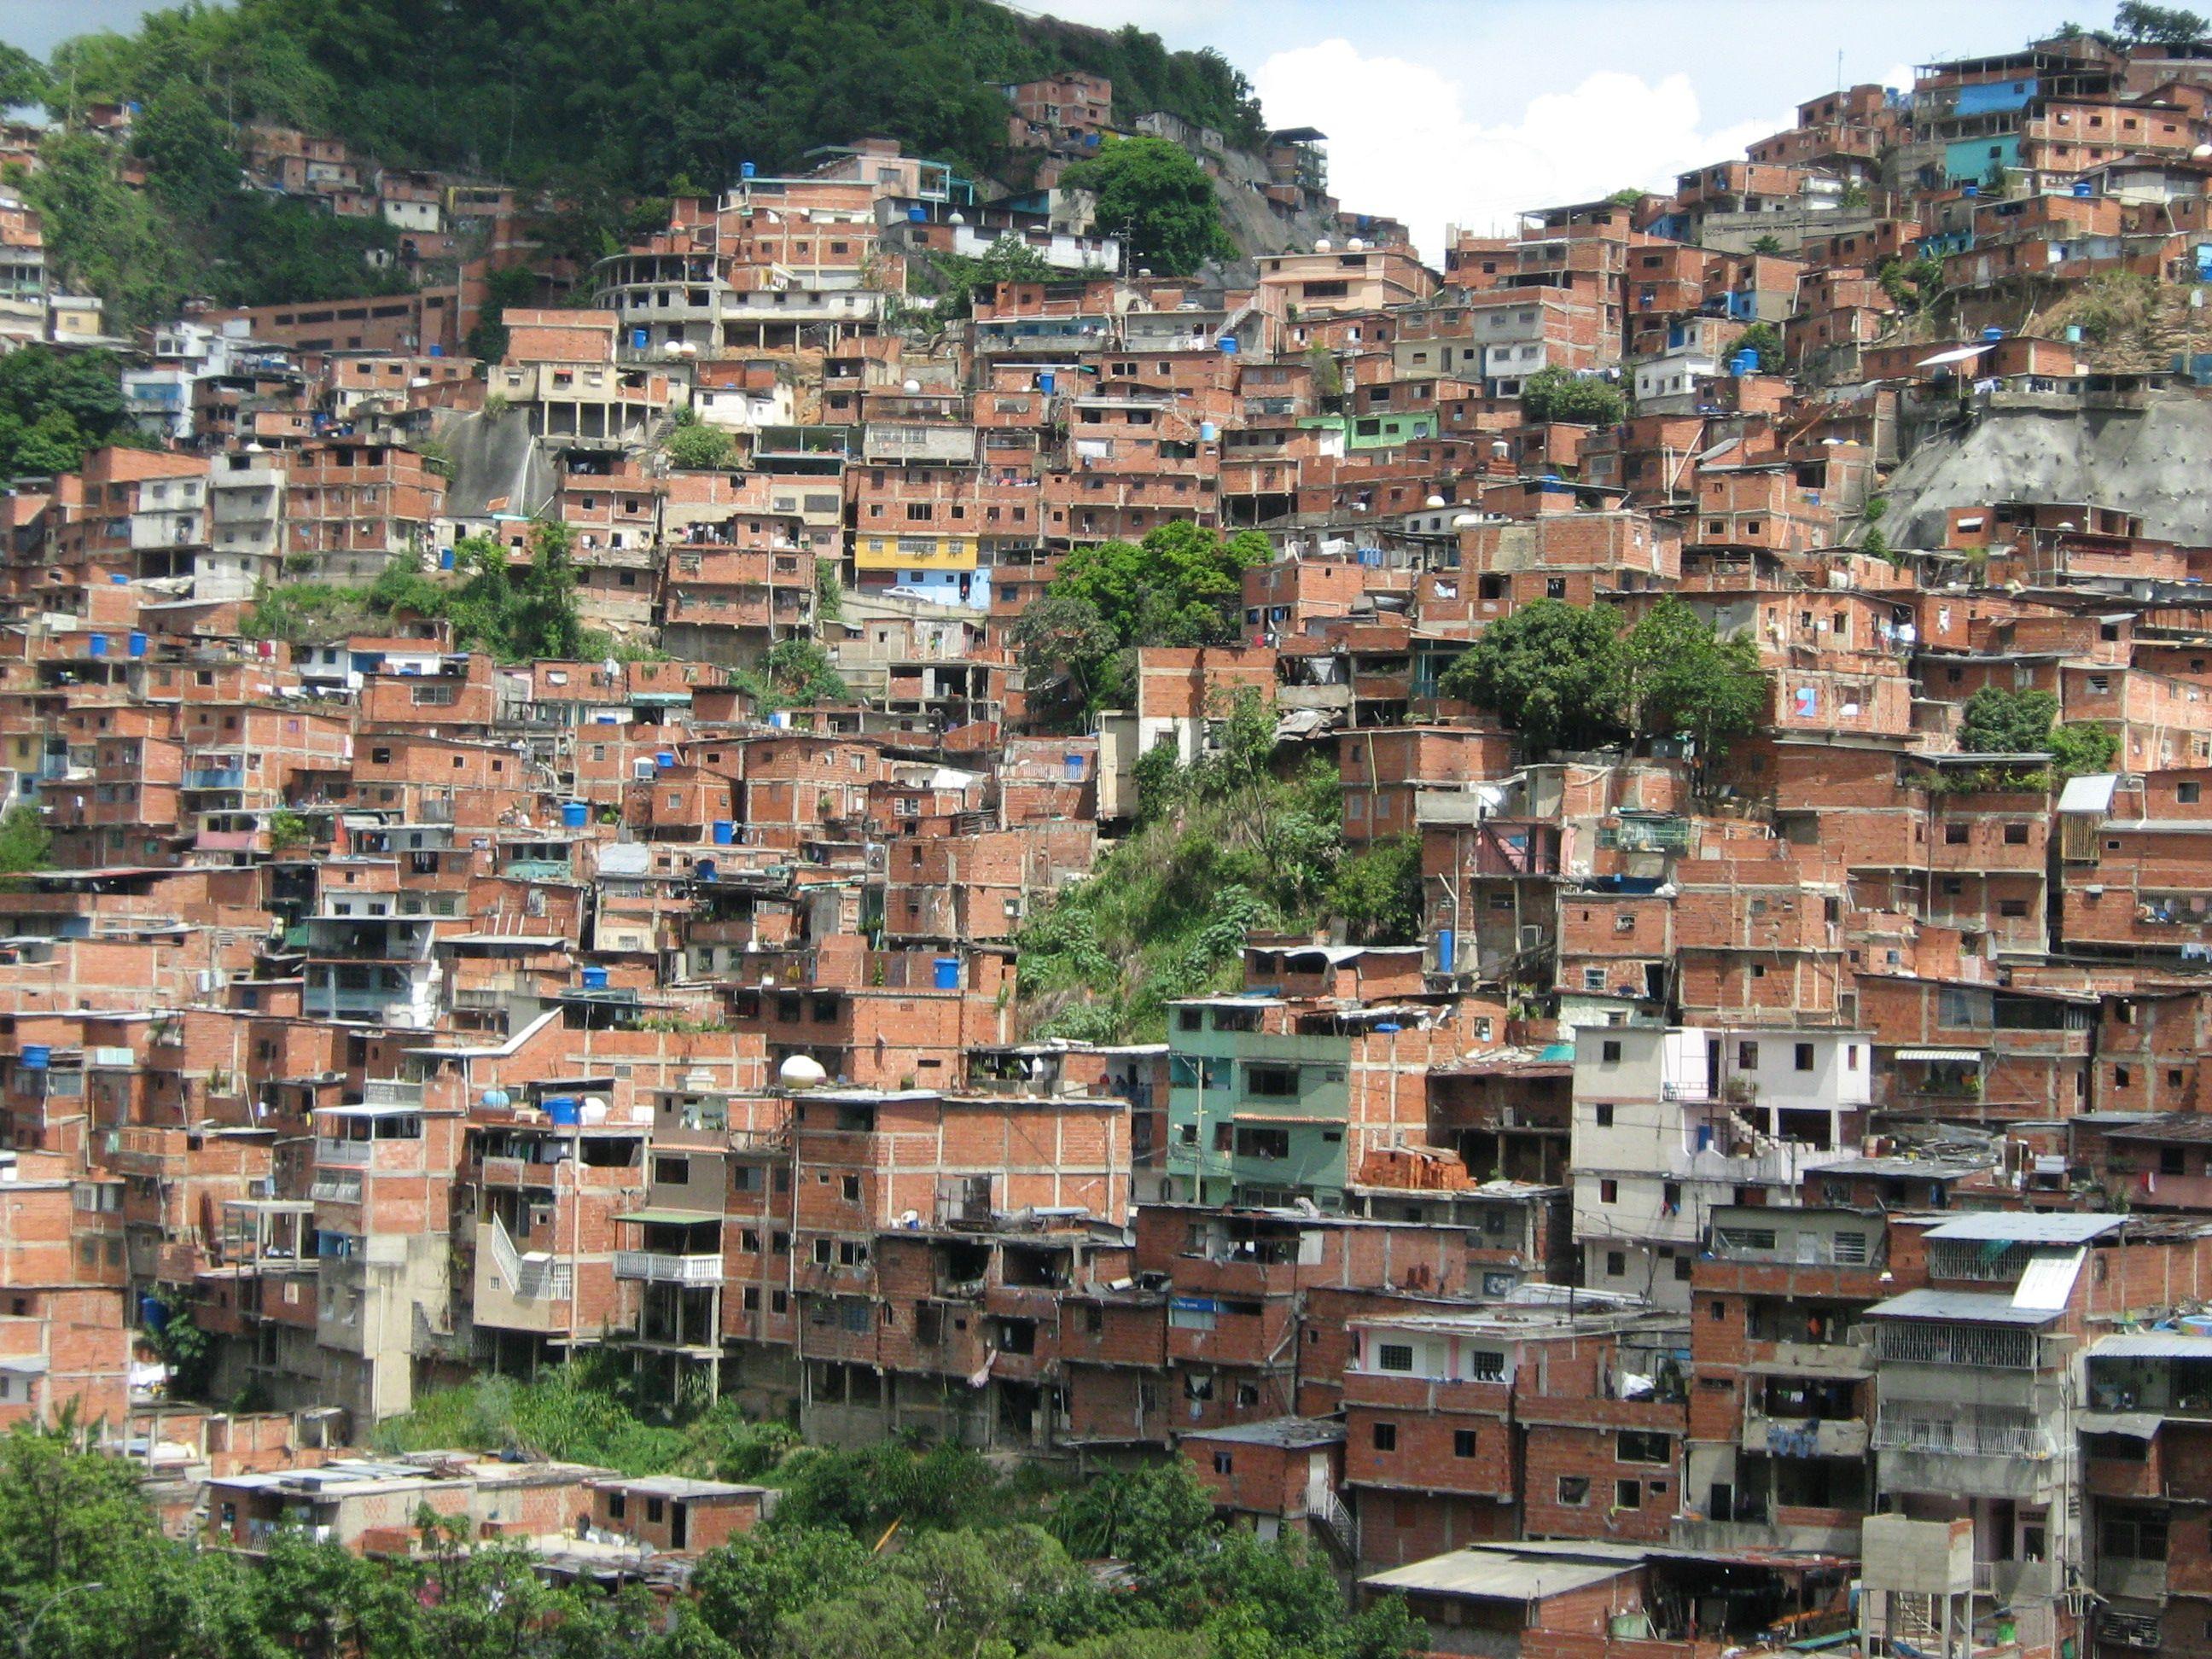 Caracas Venezuela Shanty Town Slums City Photo